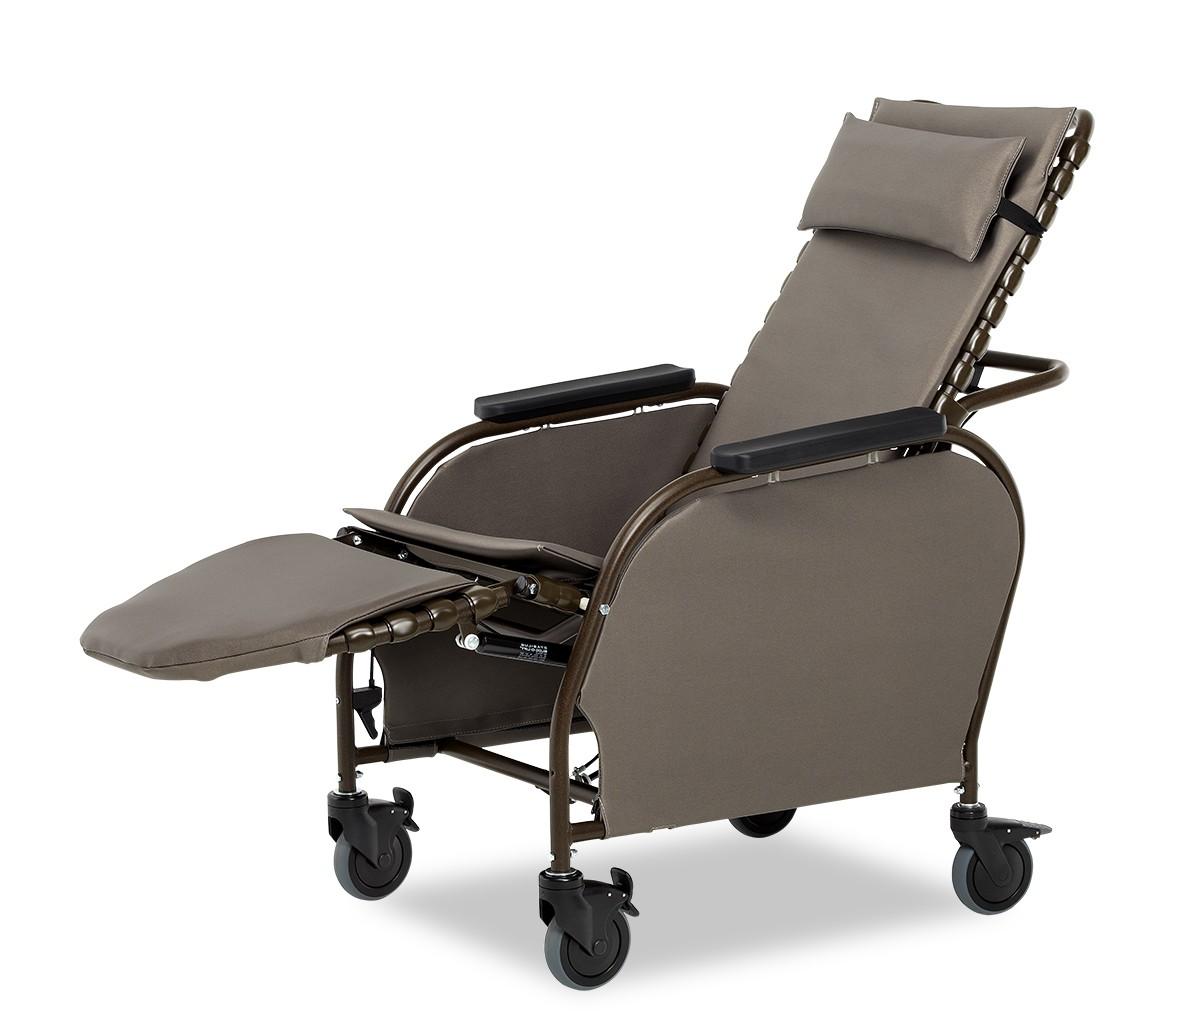 broda chair accessories light wood chairs lt tilt model